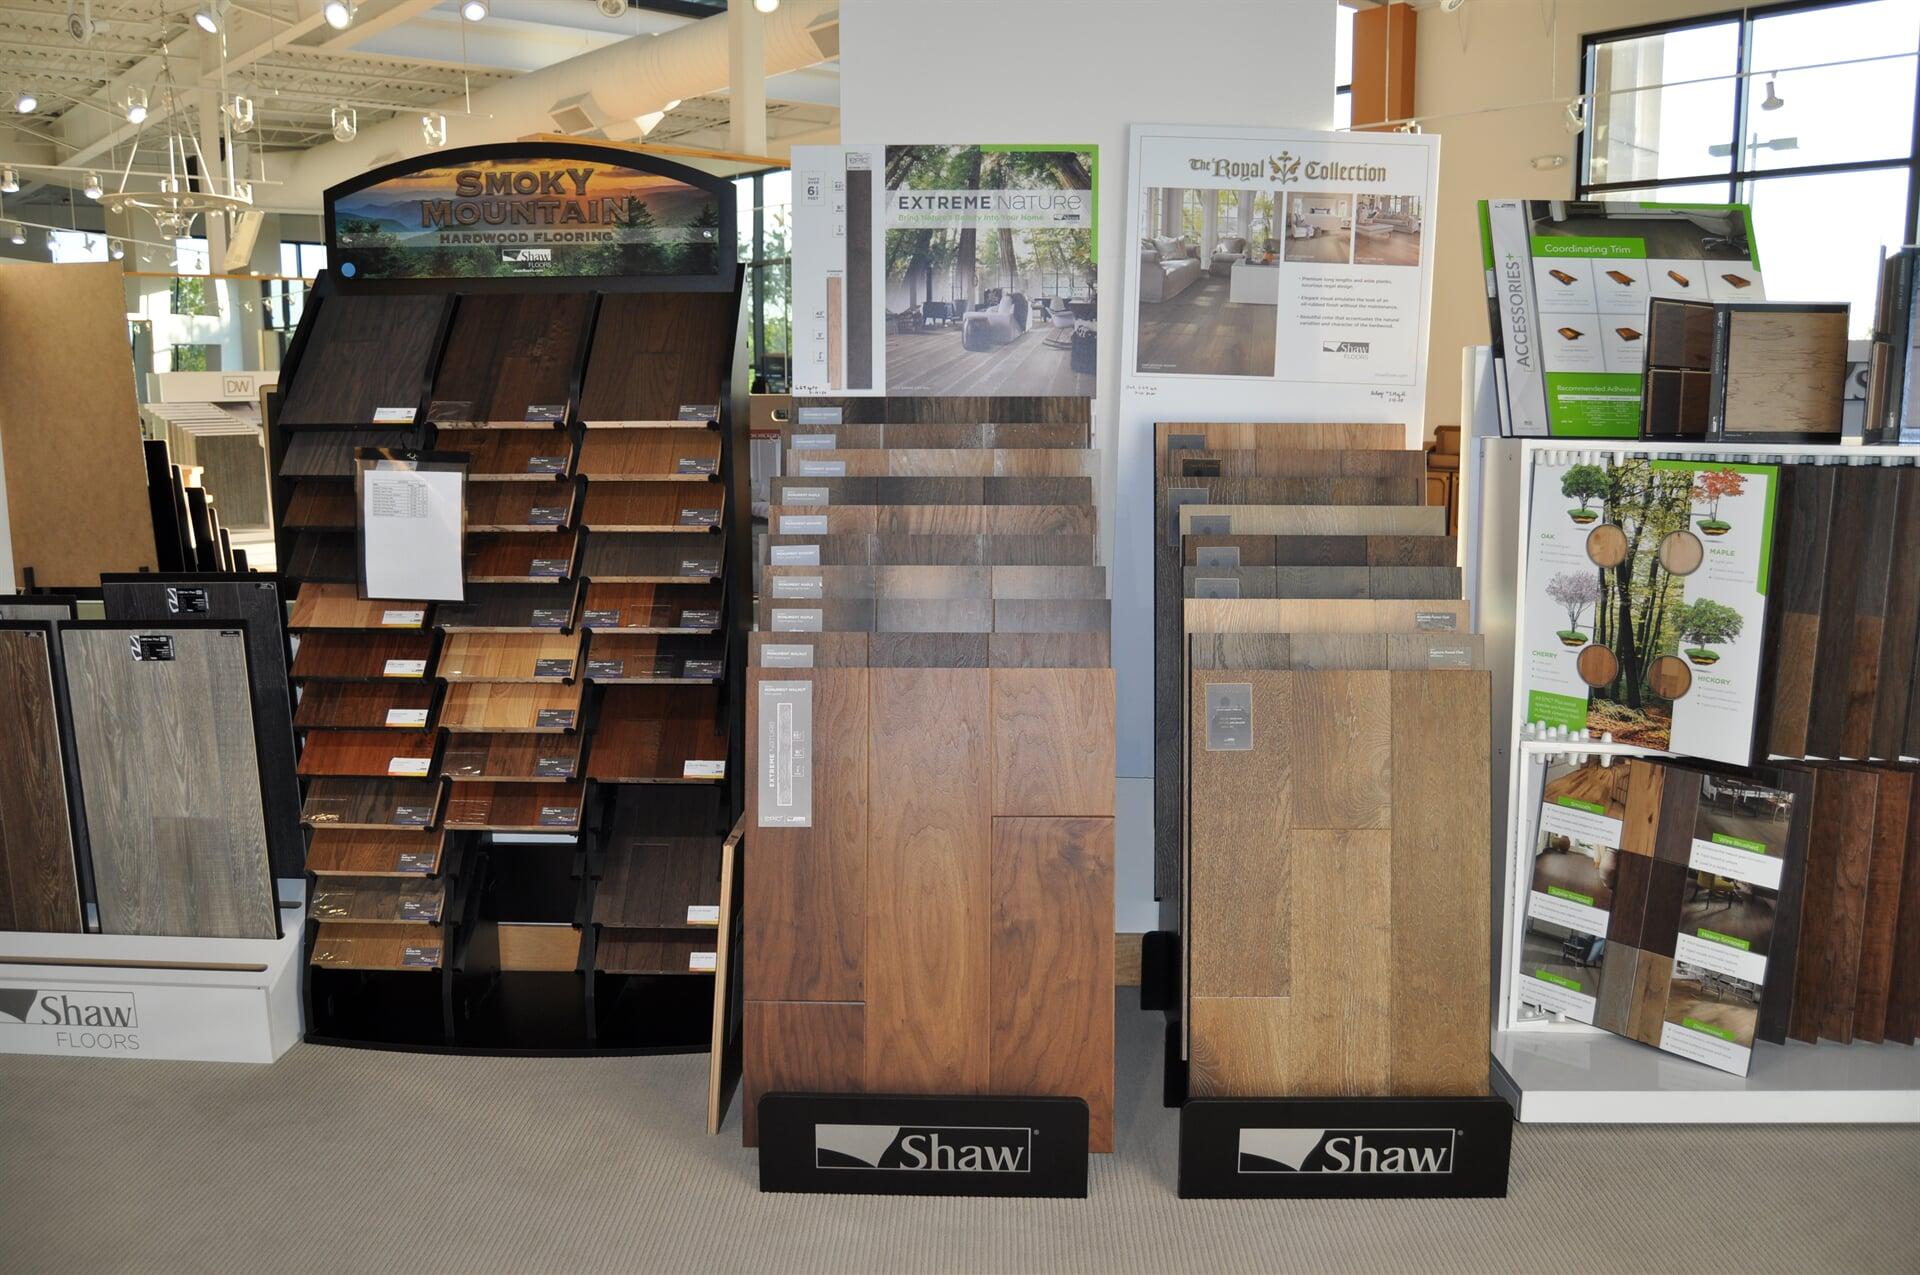 Shaw hardwood flooring for your Rome, GA home from Beckler's Flooring Center